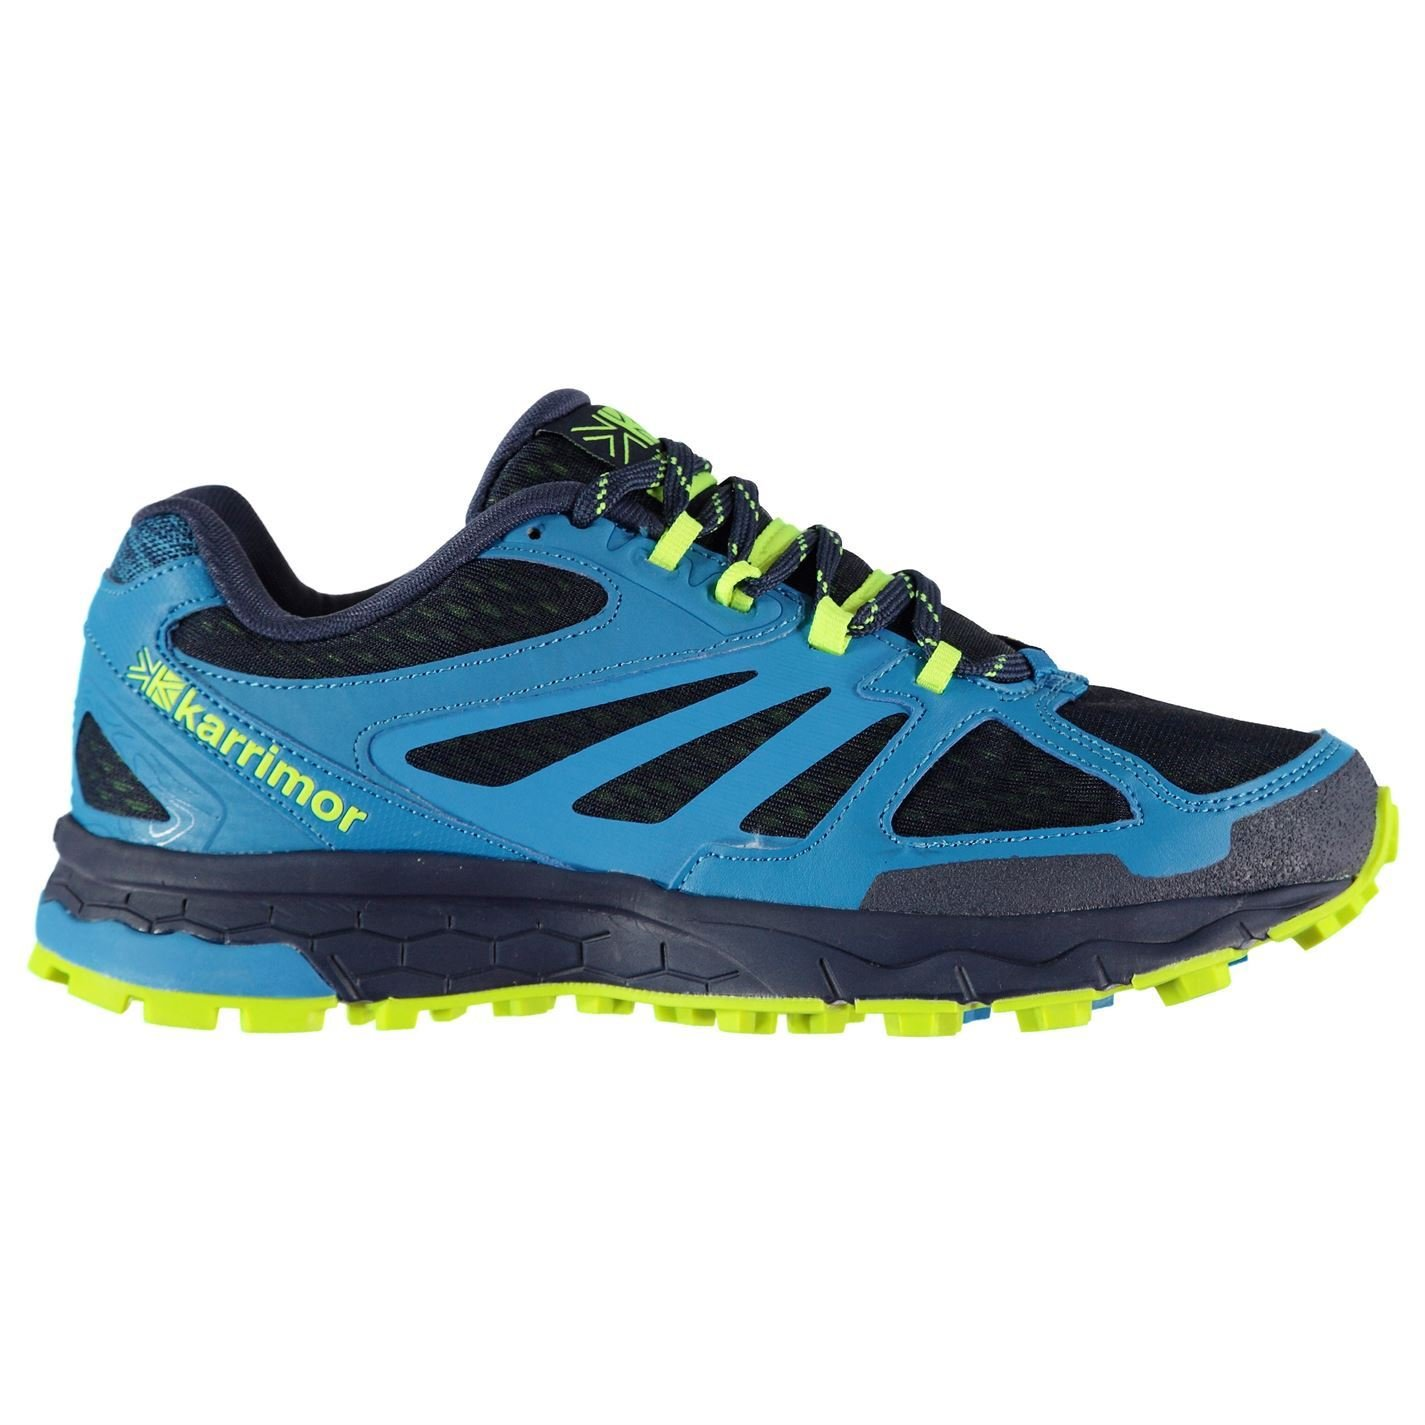 Original schuhe Karrimor Tempo 5 Trail Laufschuhe Herren blau Fitness Joggen Turnschuhe Turnschuhe